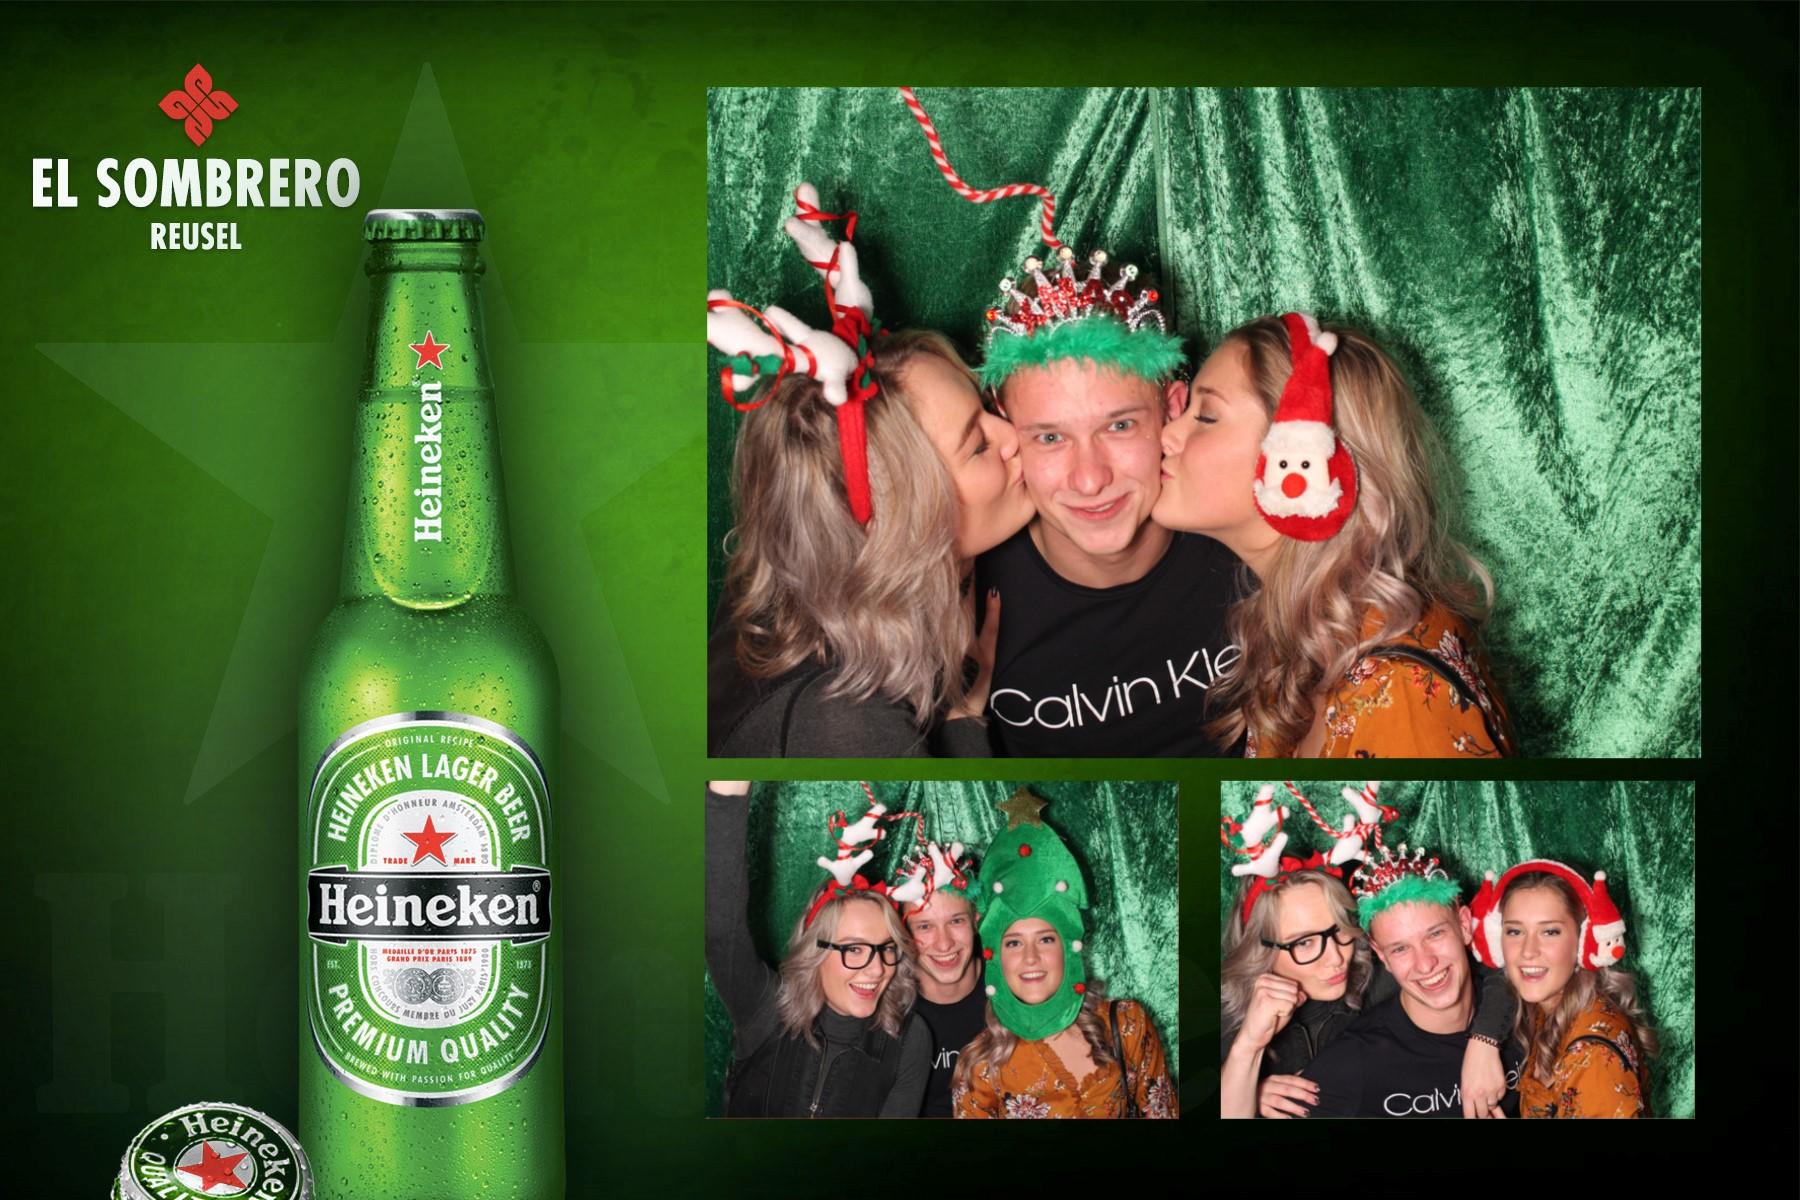 Heineken photobooth